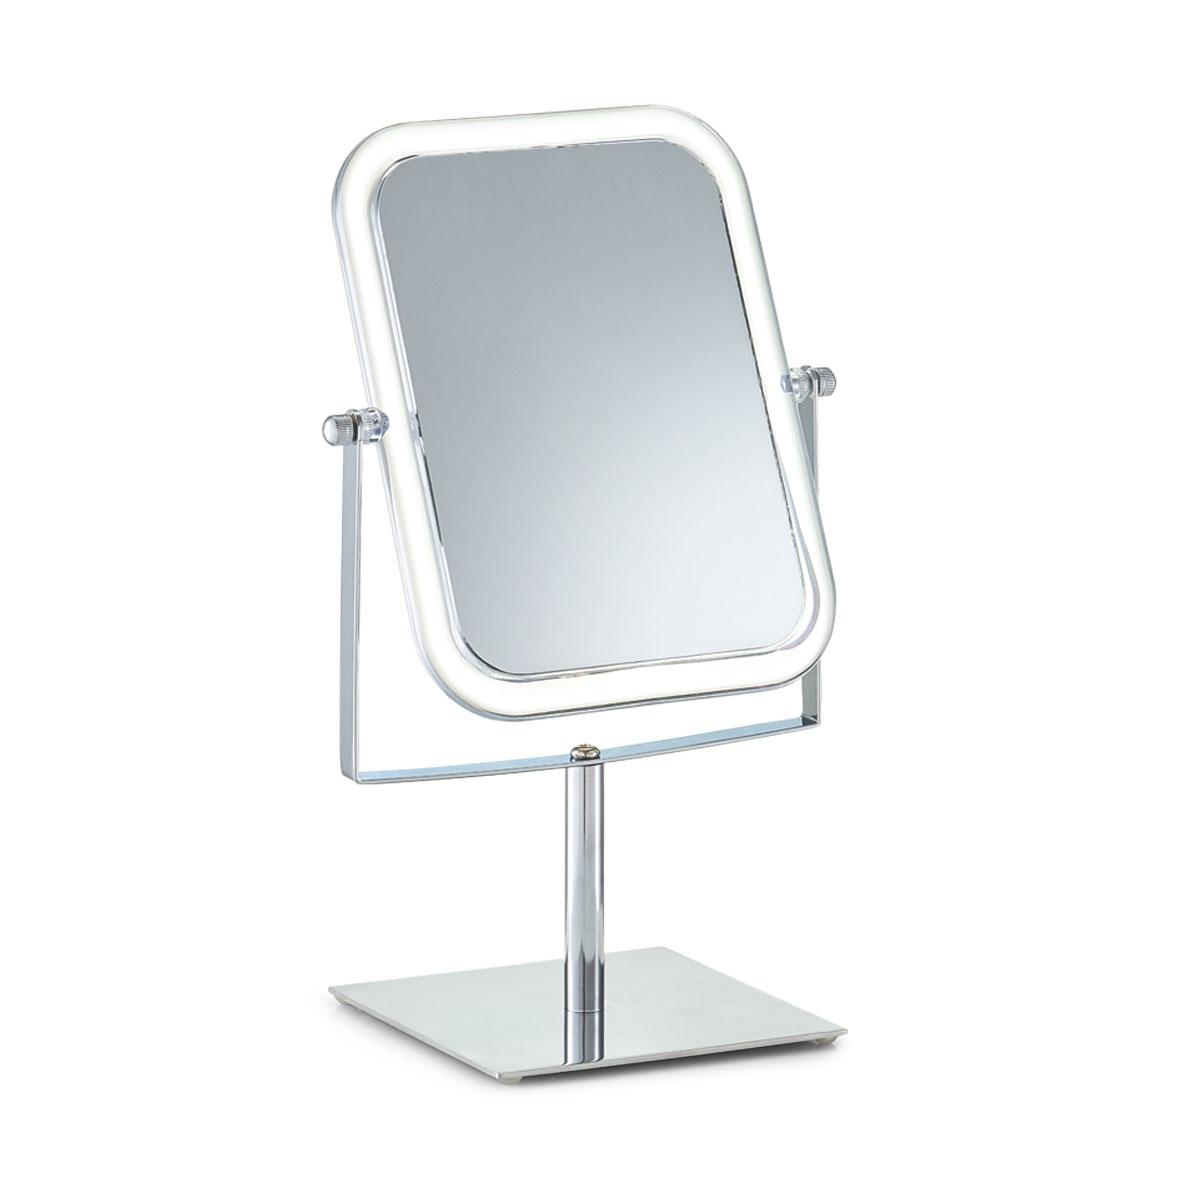 Oglinda cosmetica de masa Metal Cromat l185xA125xH30 cm